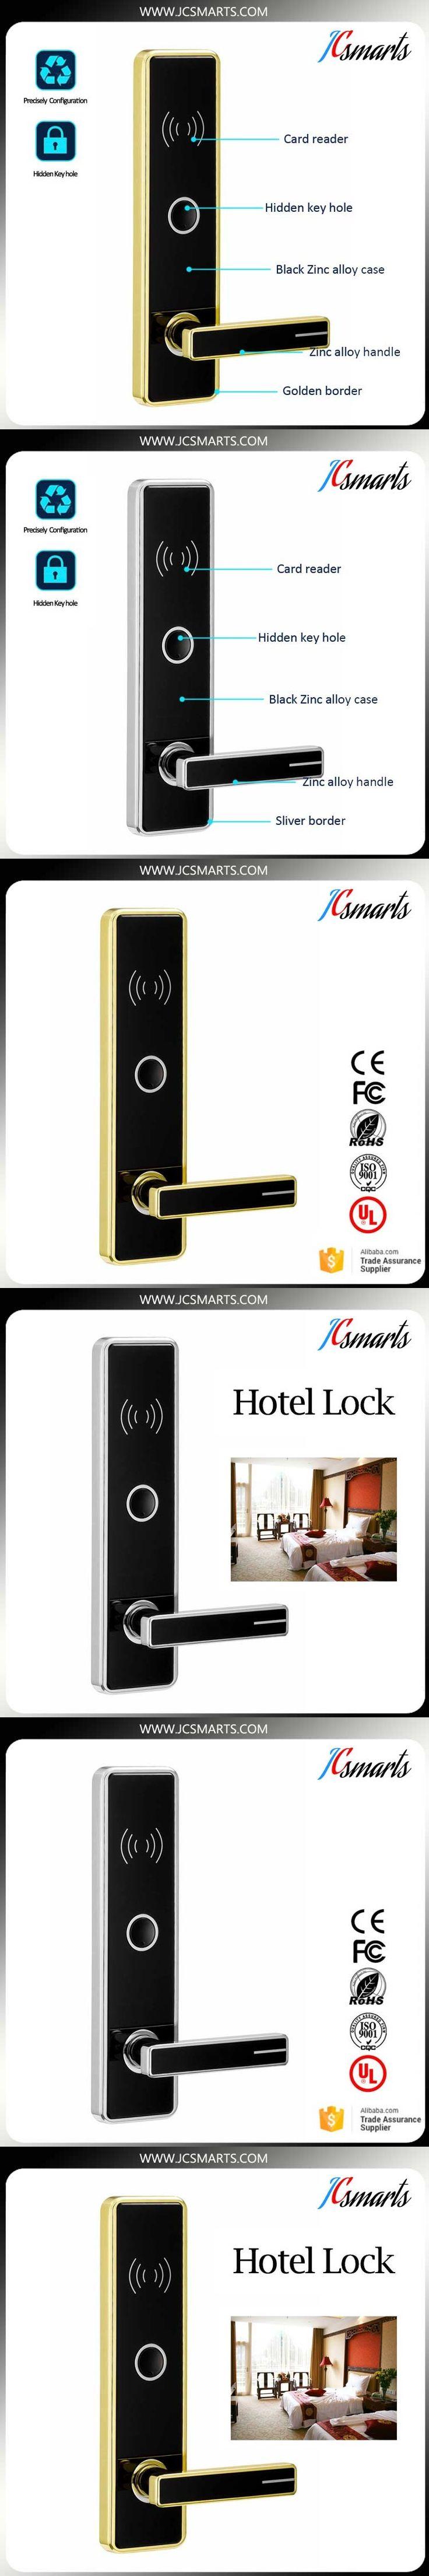 Best 25+ Hotel lock ideas on Pinterest | Digital lock, Hotel ...